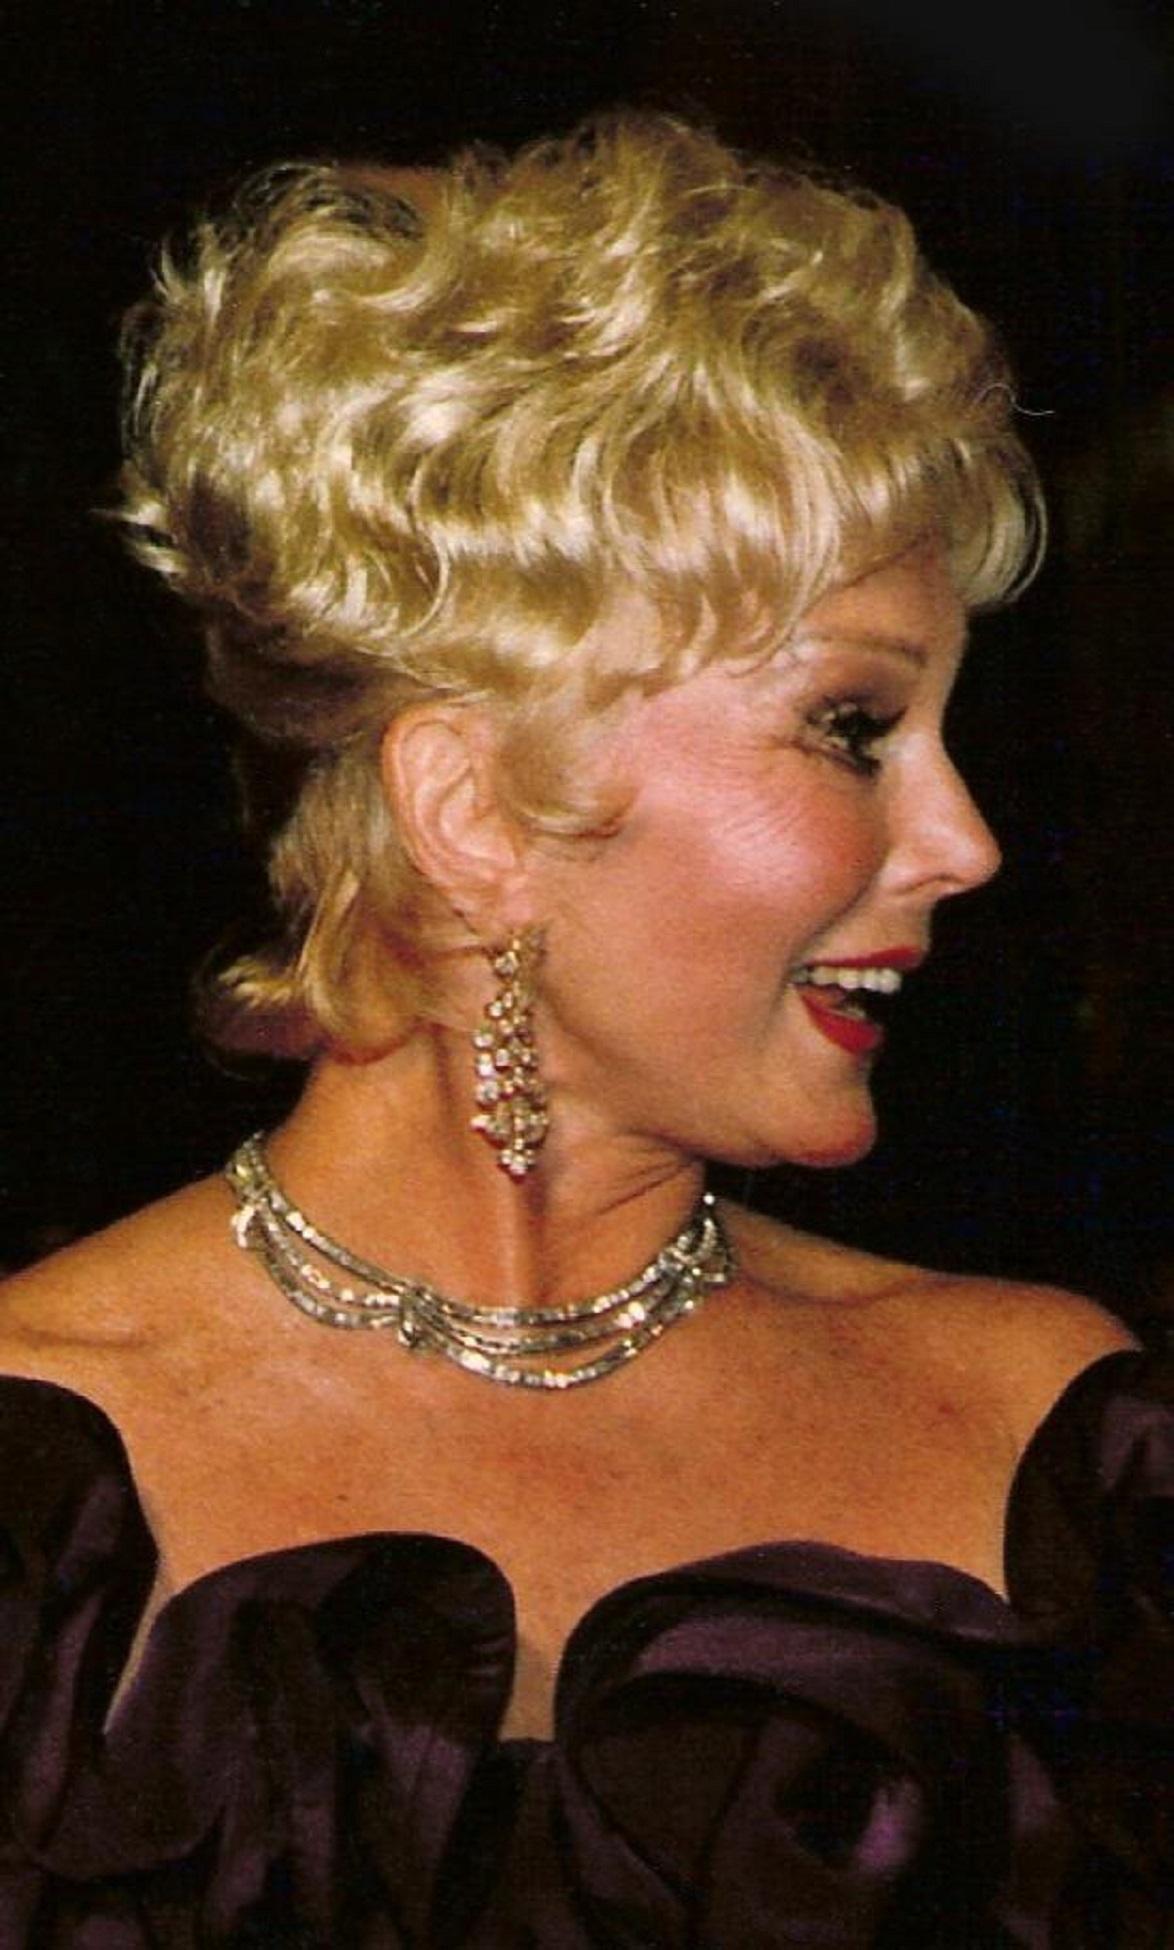 fotos gratis cabello vendimia pelcula hollywood nostalgia moda televisin ejecutante peinado pelo largo rubio celebridad